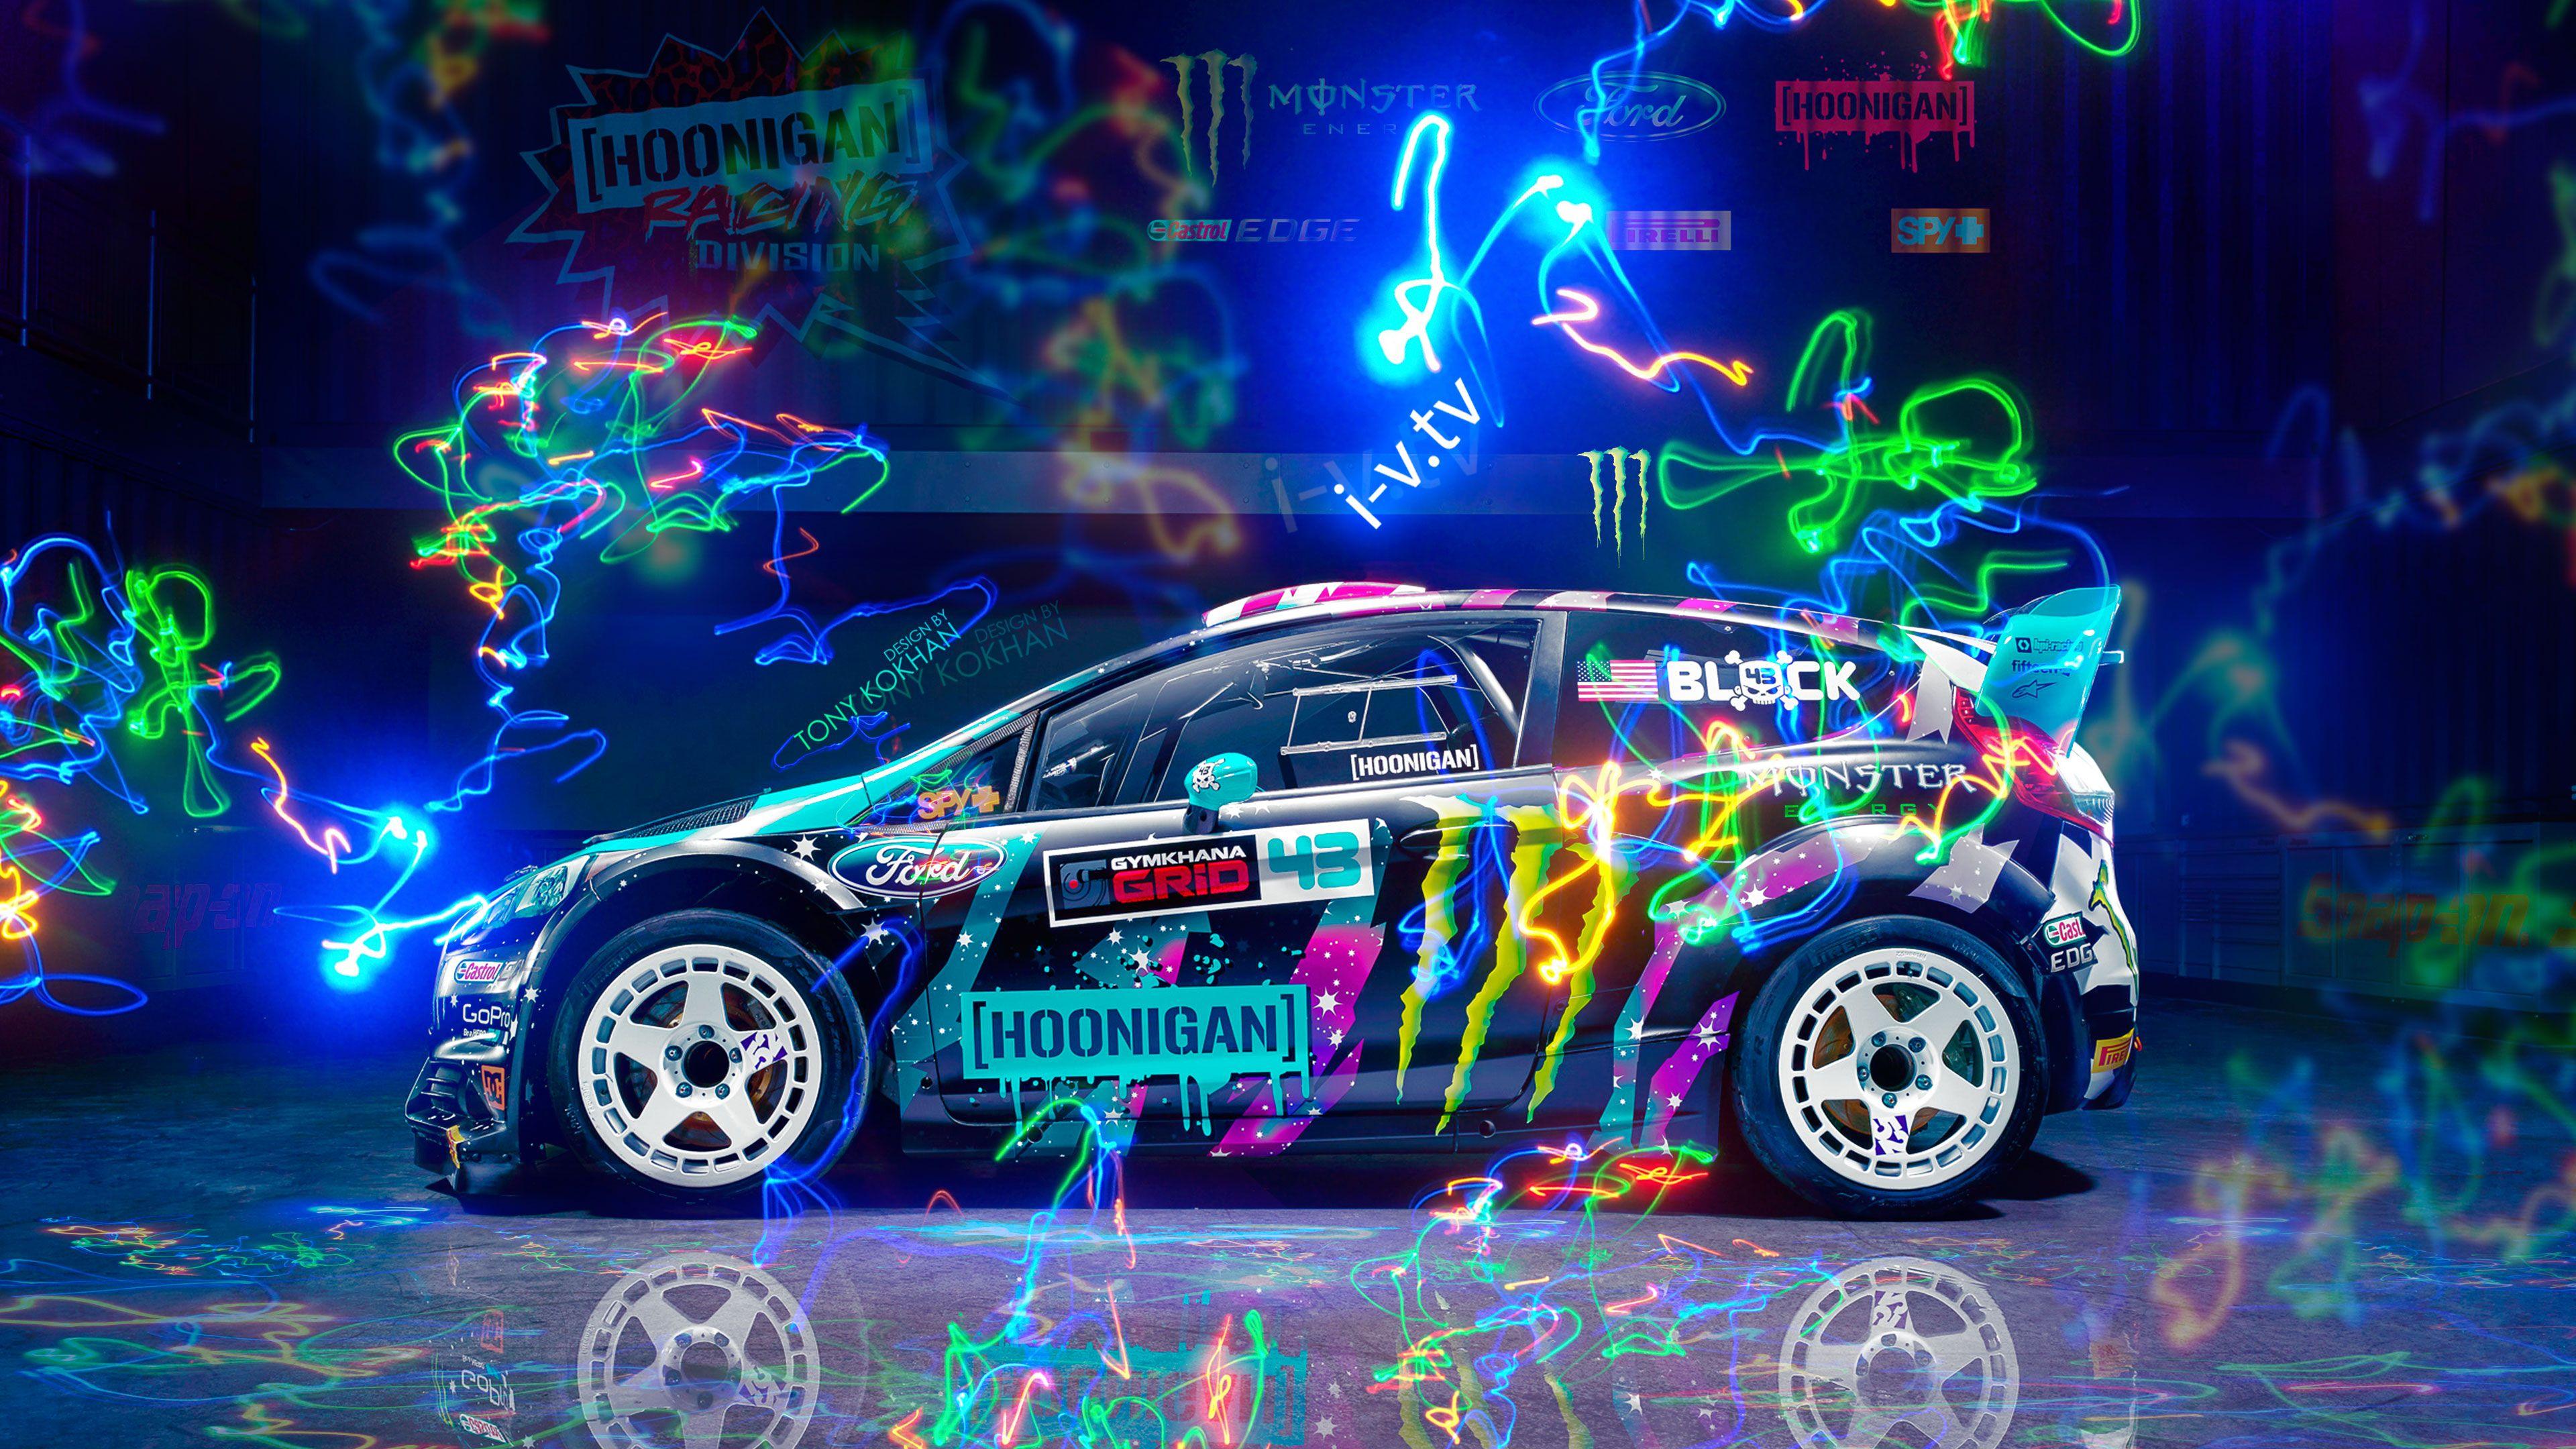 Wallpaper Ford Fiesta Colorful Car Hoonigan Ken Block 3840x2160 Ripperdcd 1303795 Hd Wallpapers Wallhere